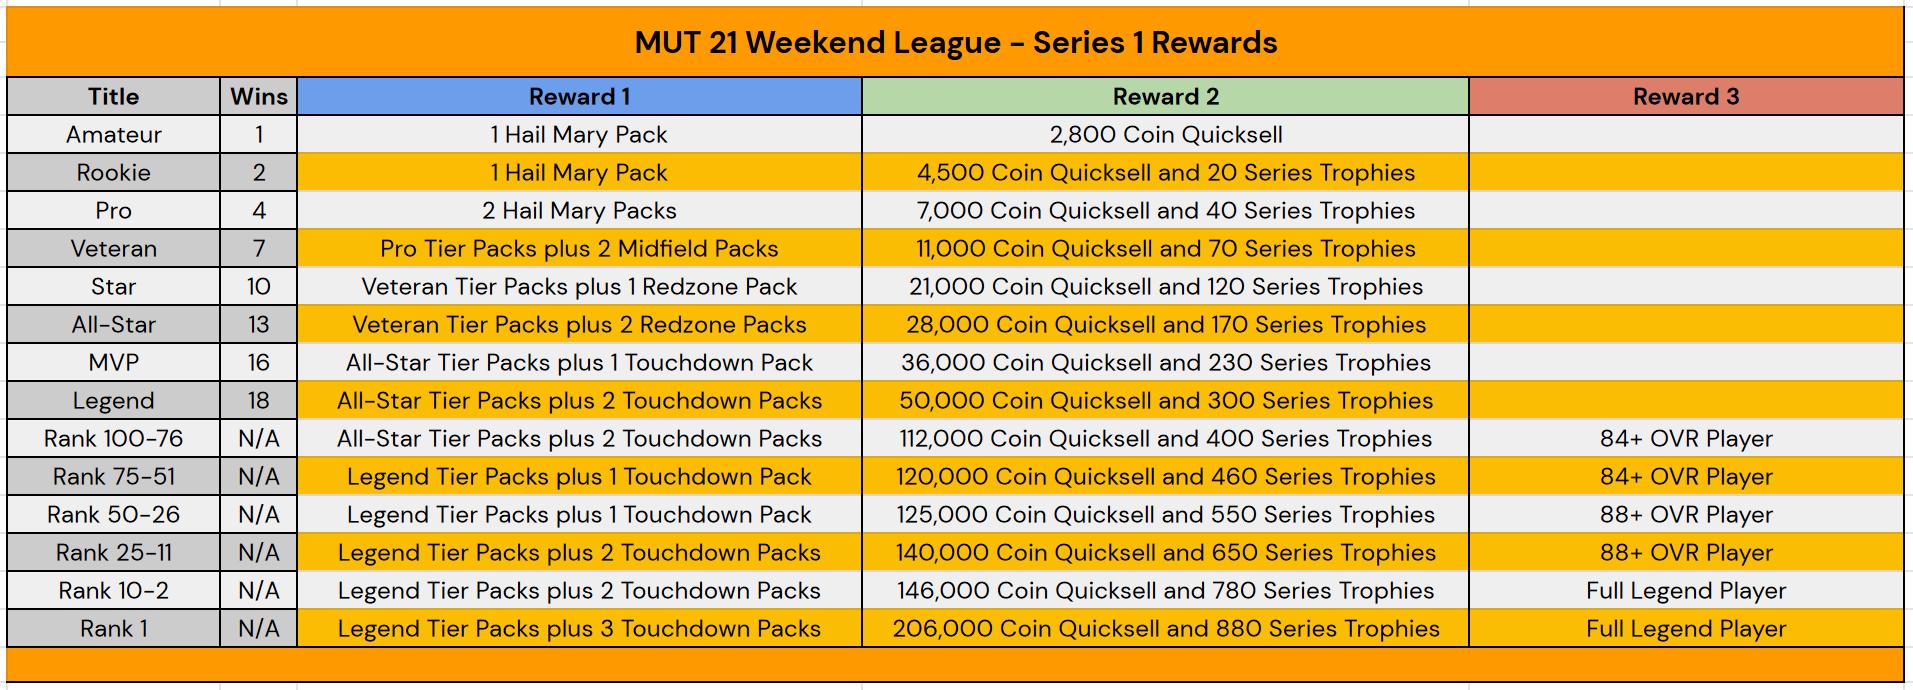 Madden 21 Weekend League Rewards